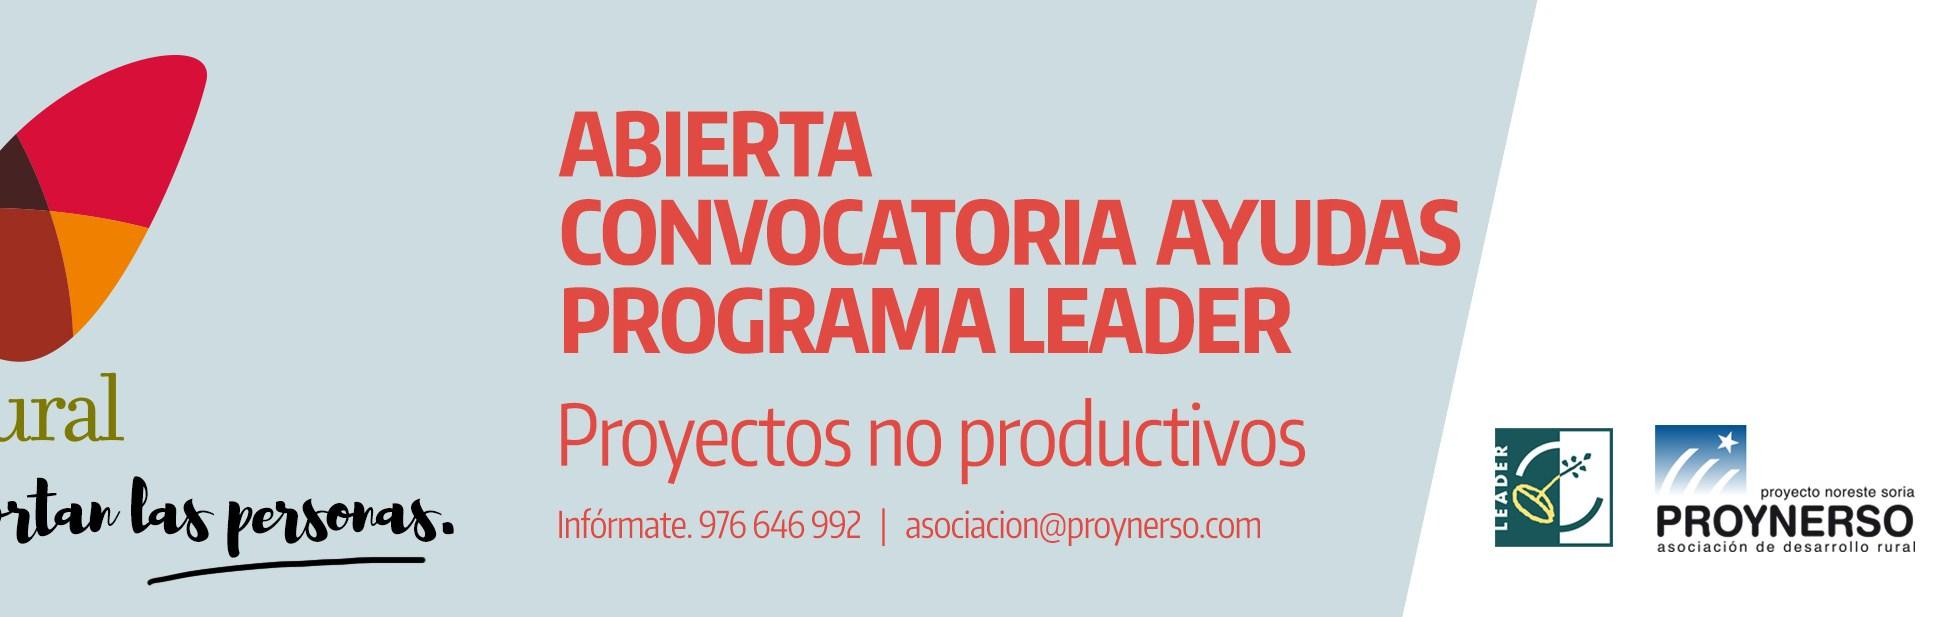 banner-ayudas-noproductivas-ok